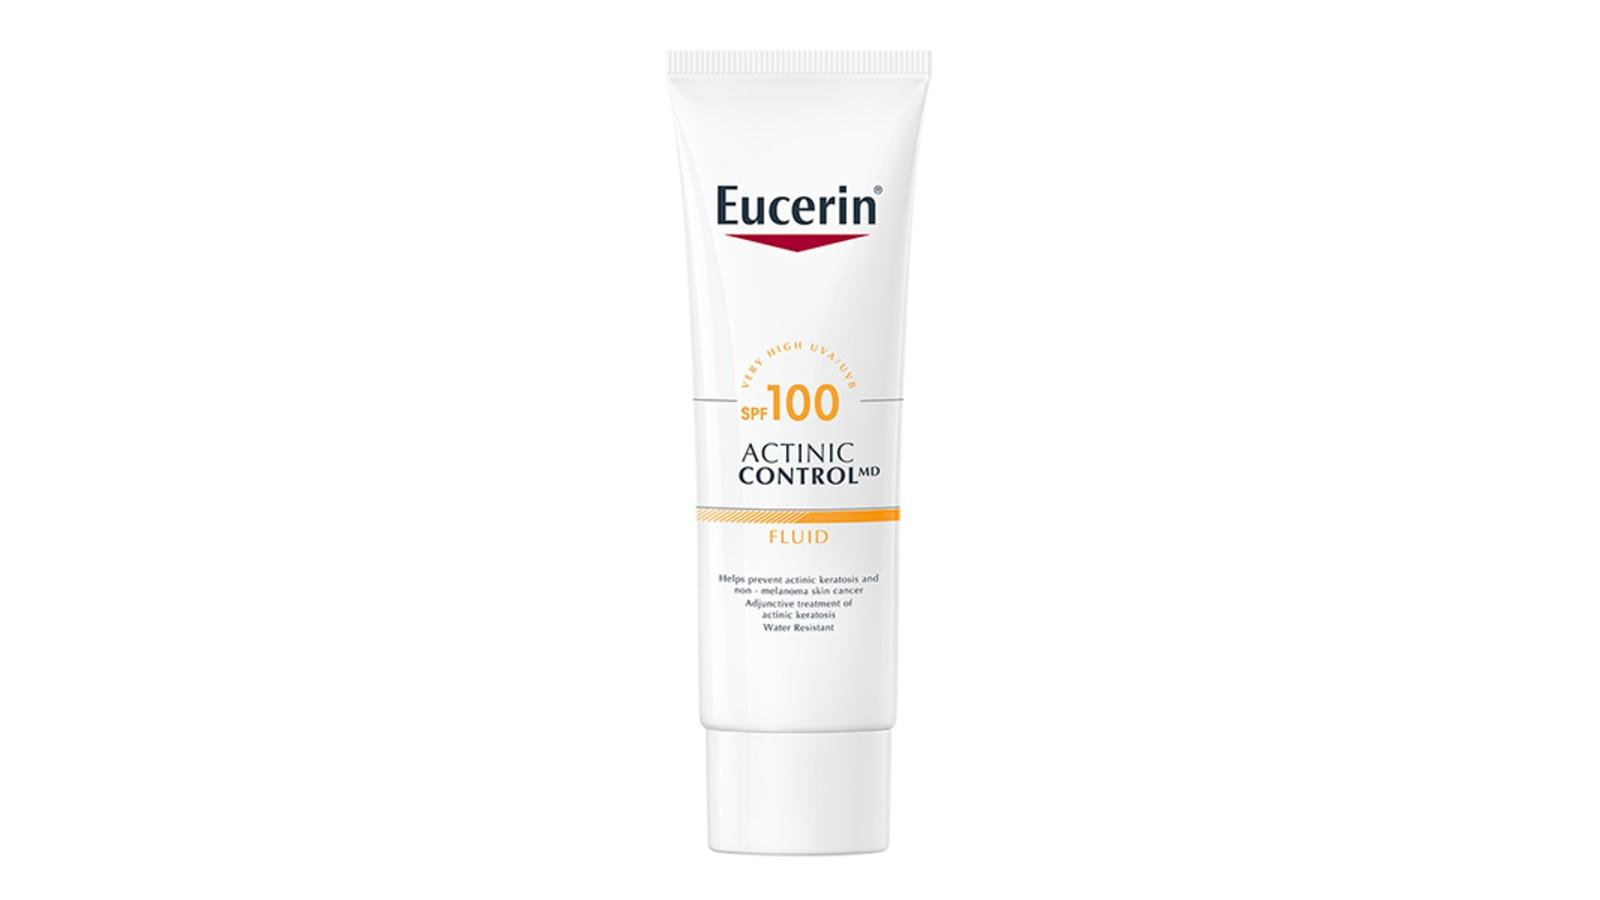 Eucerin Actinic Control Fluid SPF100